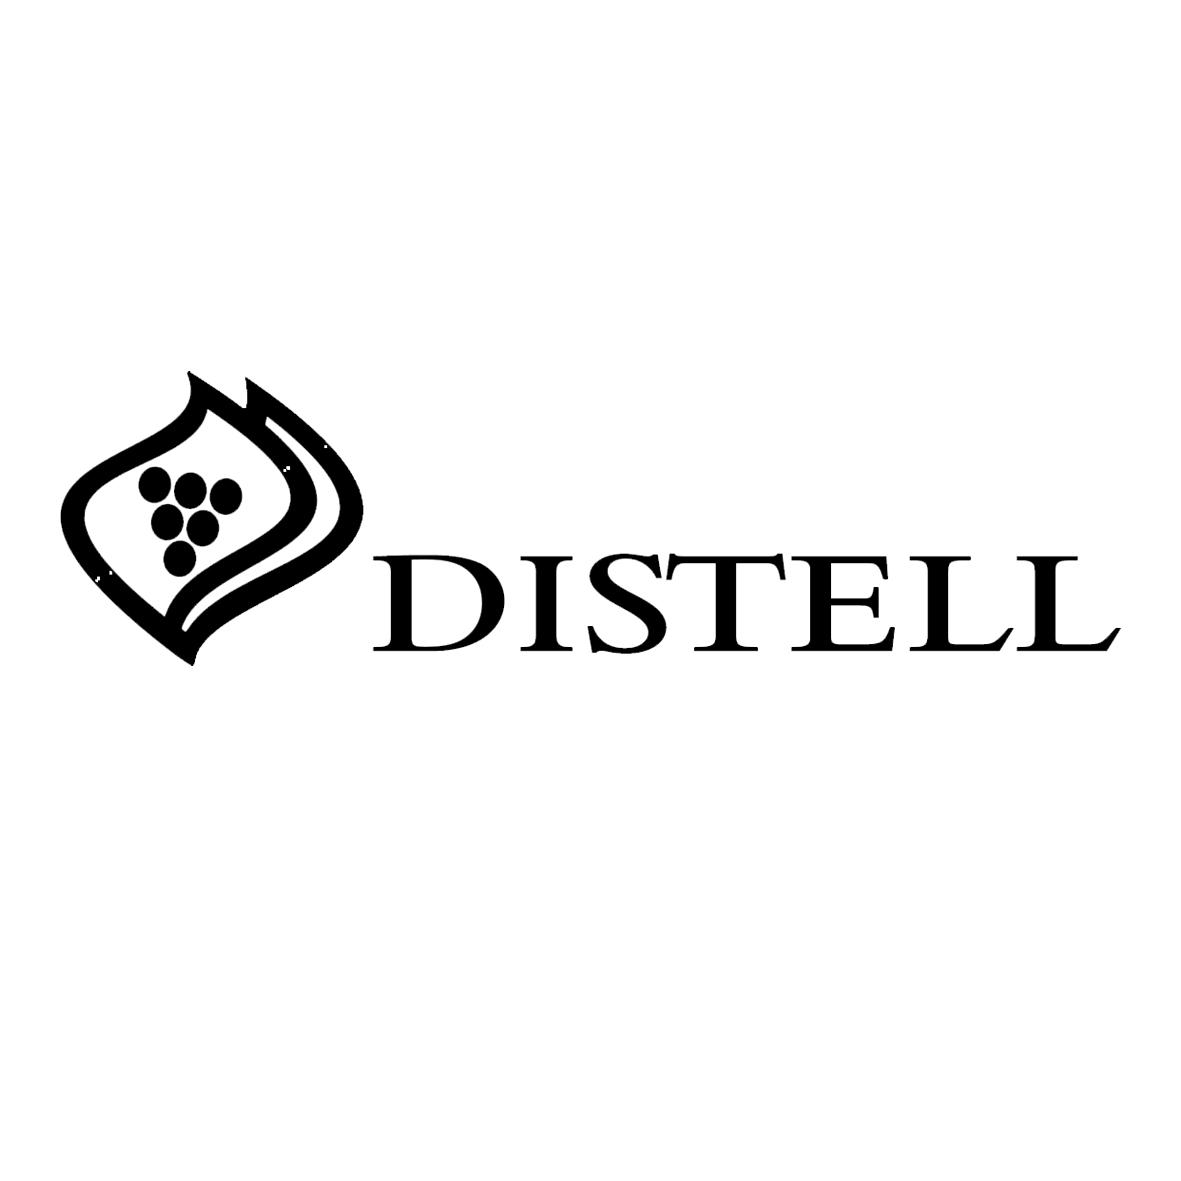 Distell.jpg